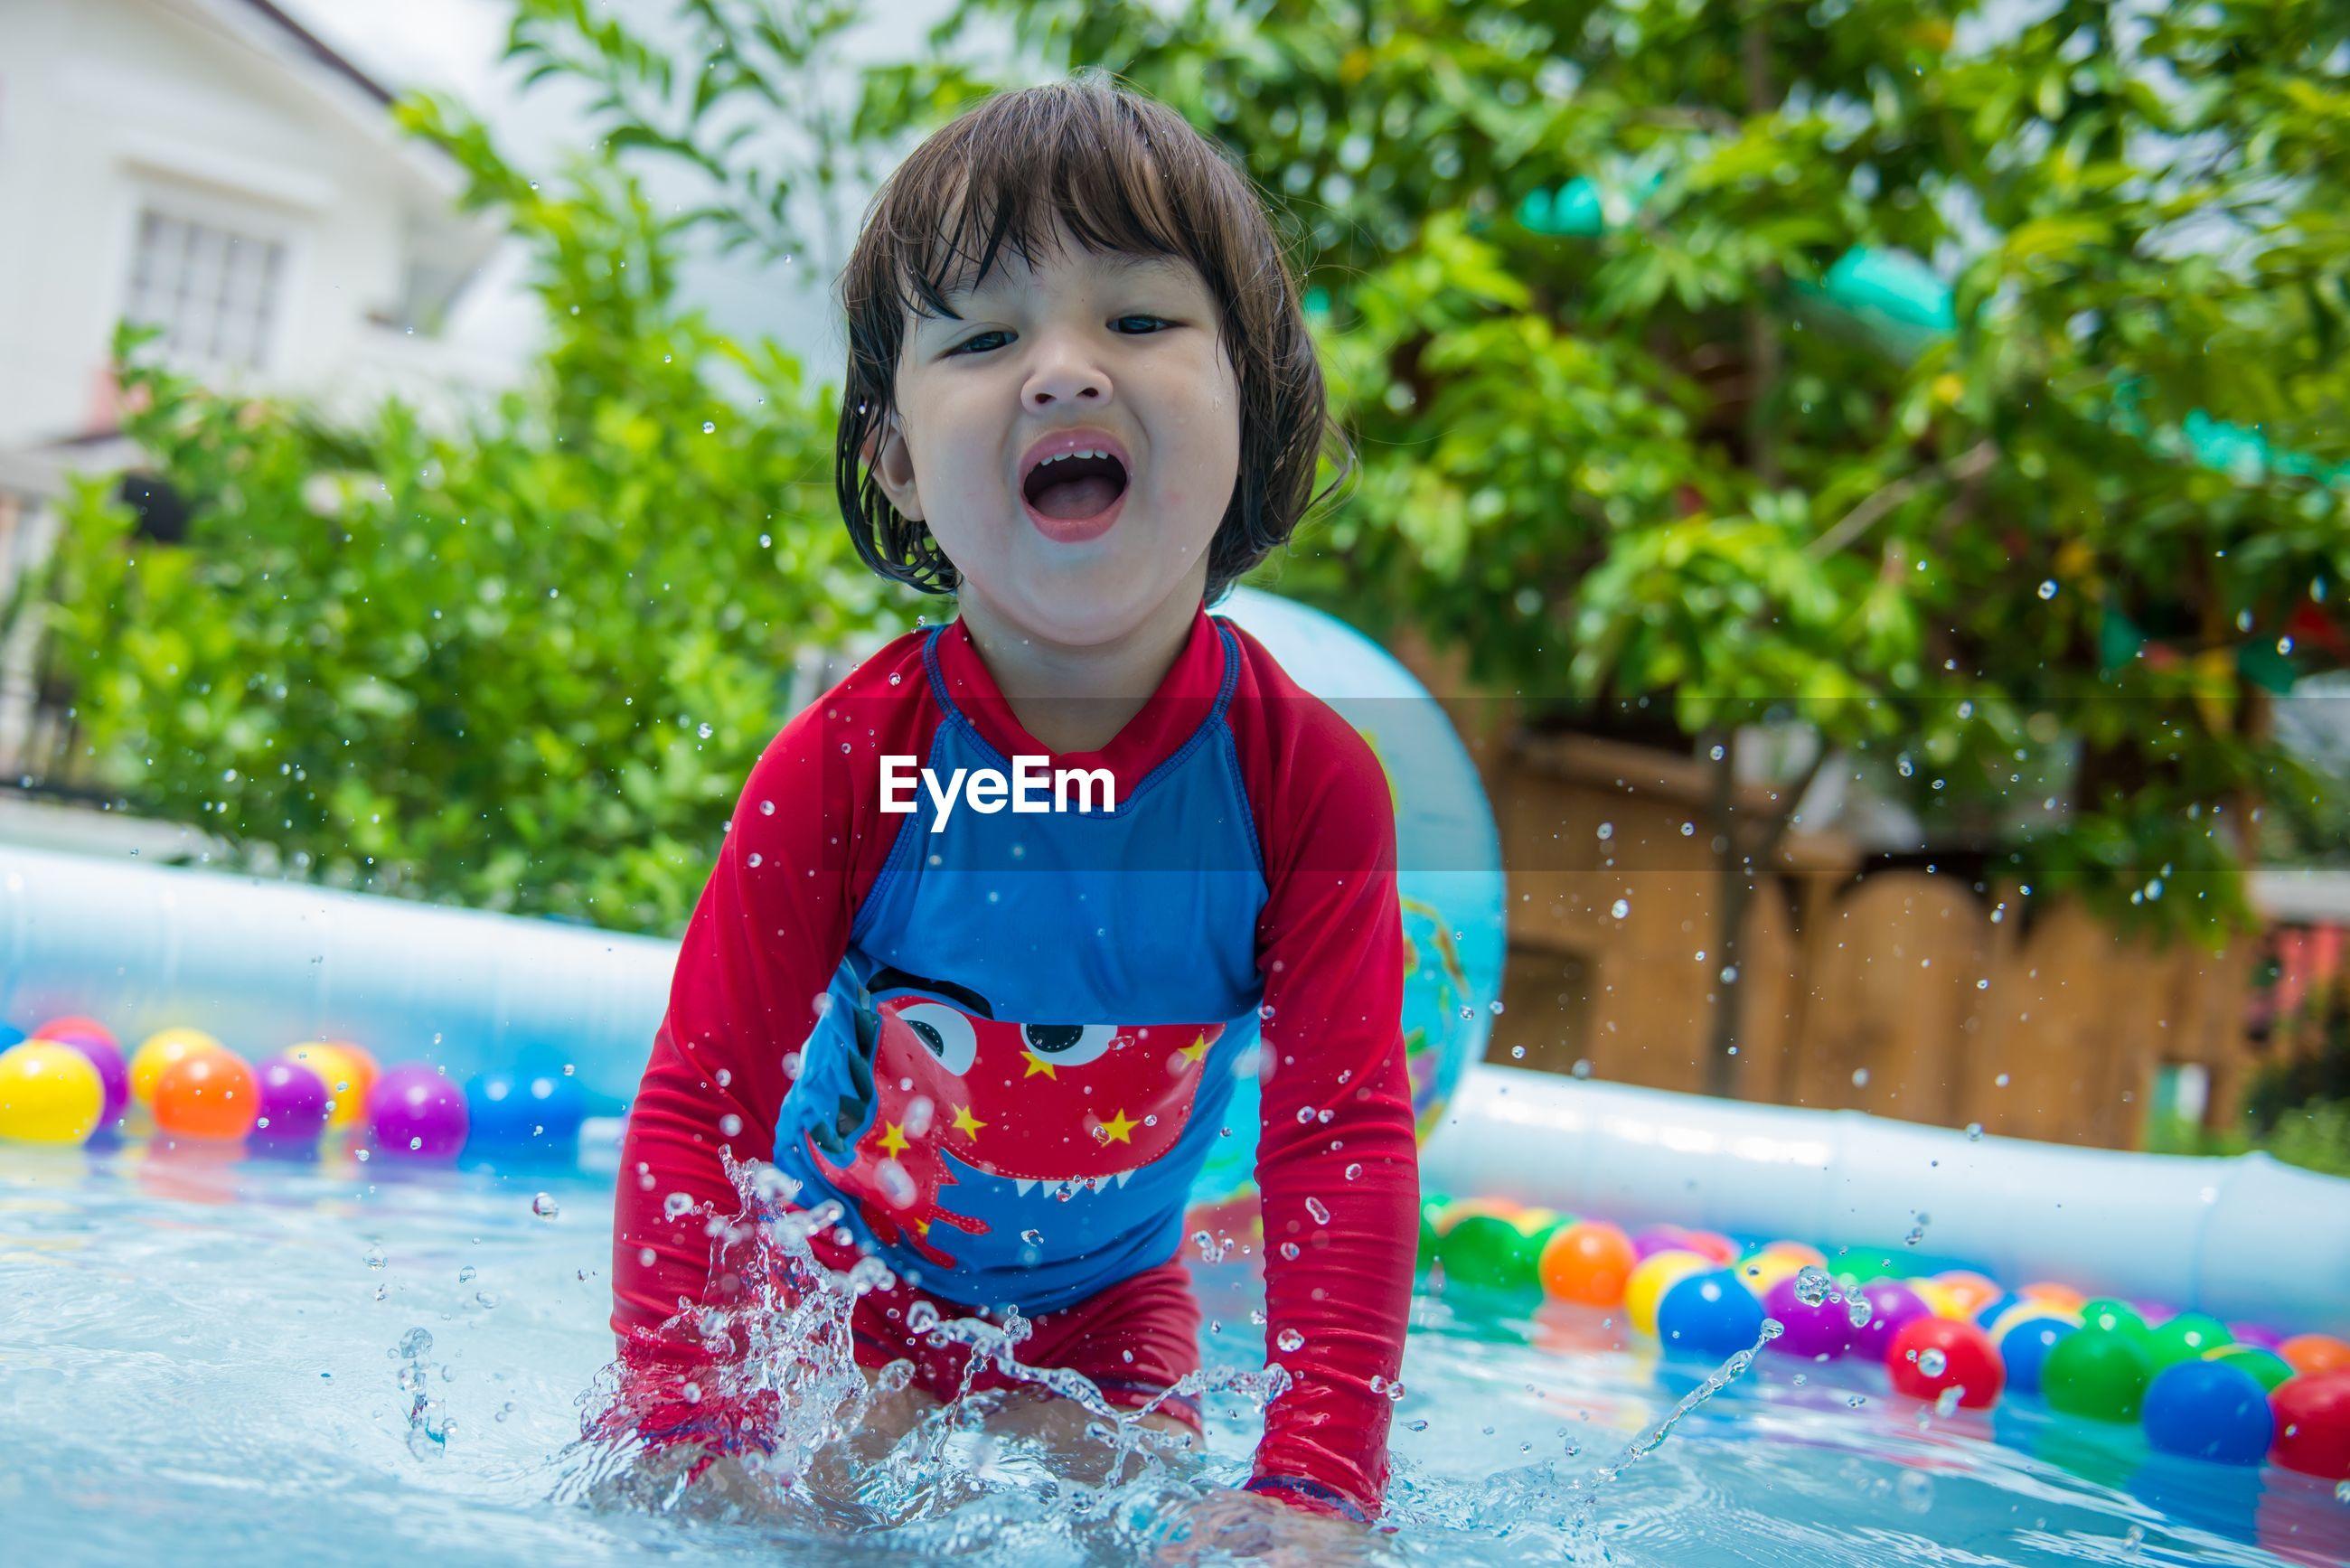 Cute boy playing in swimming pool